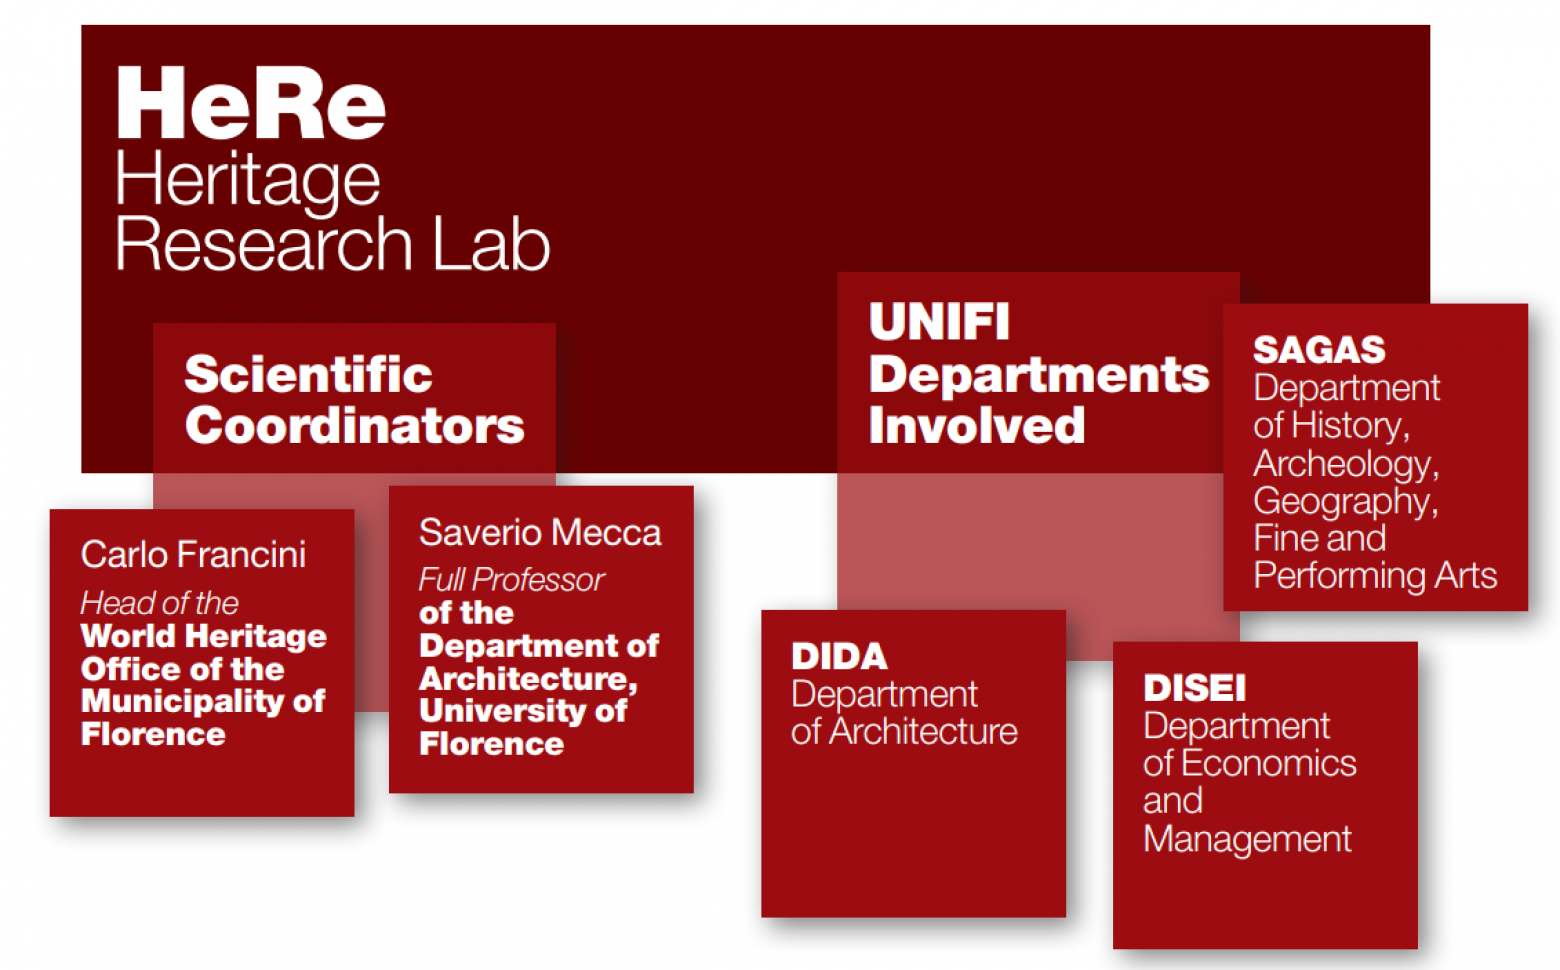 DIDA Comunication Lab